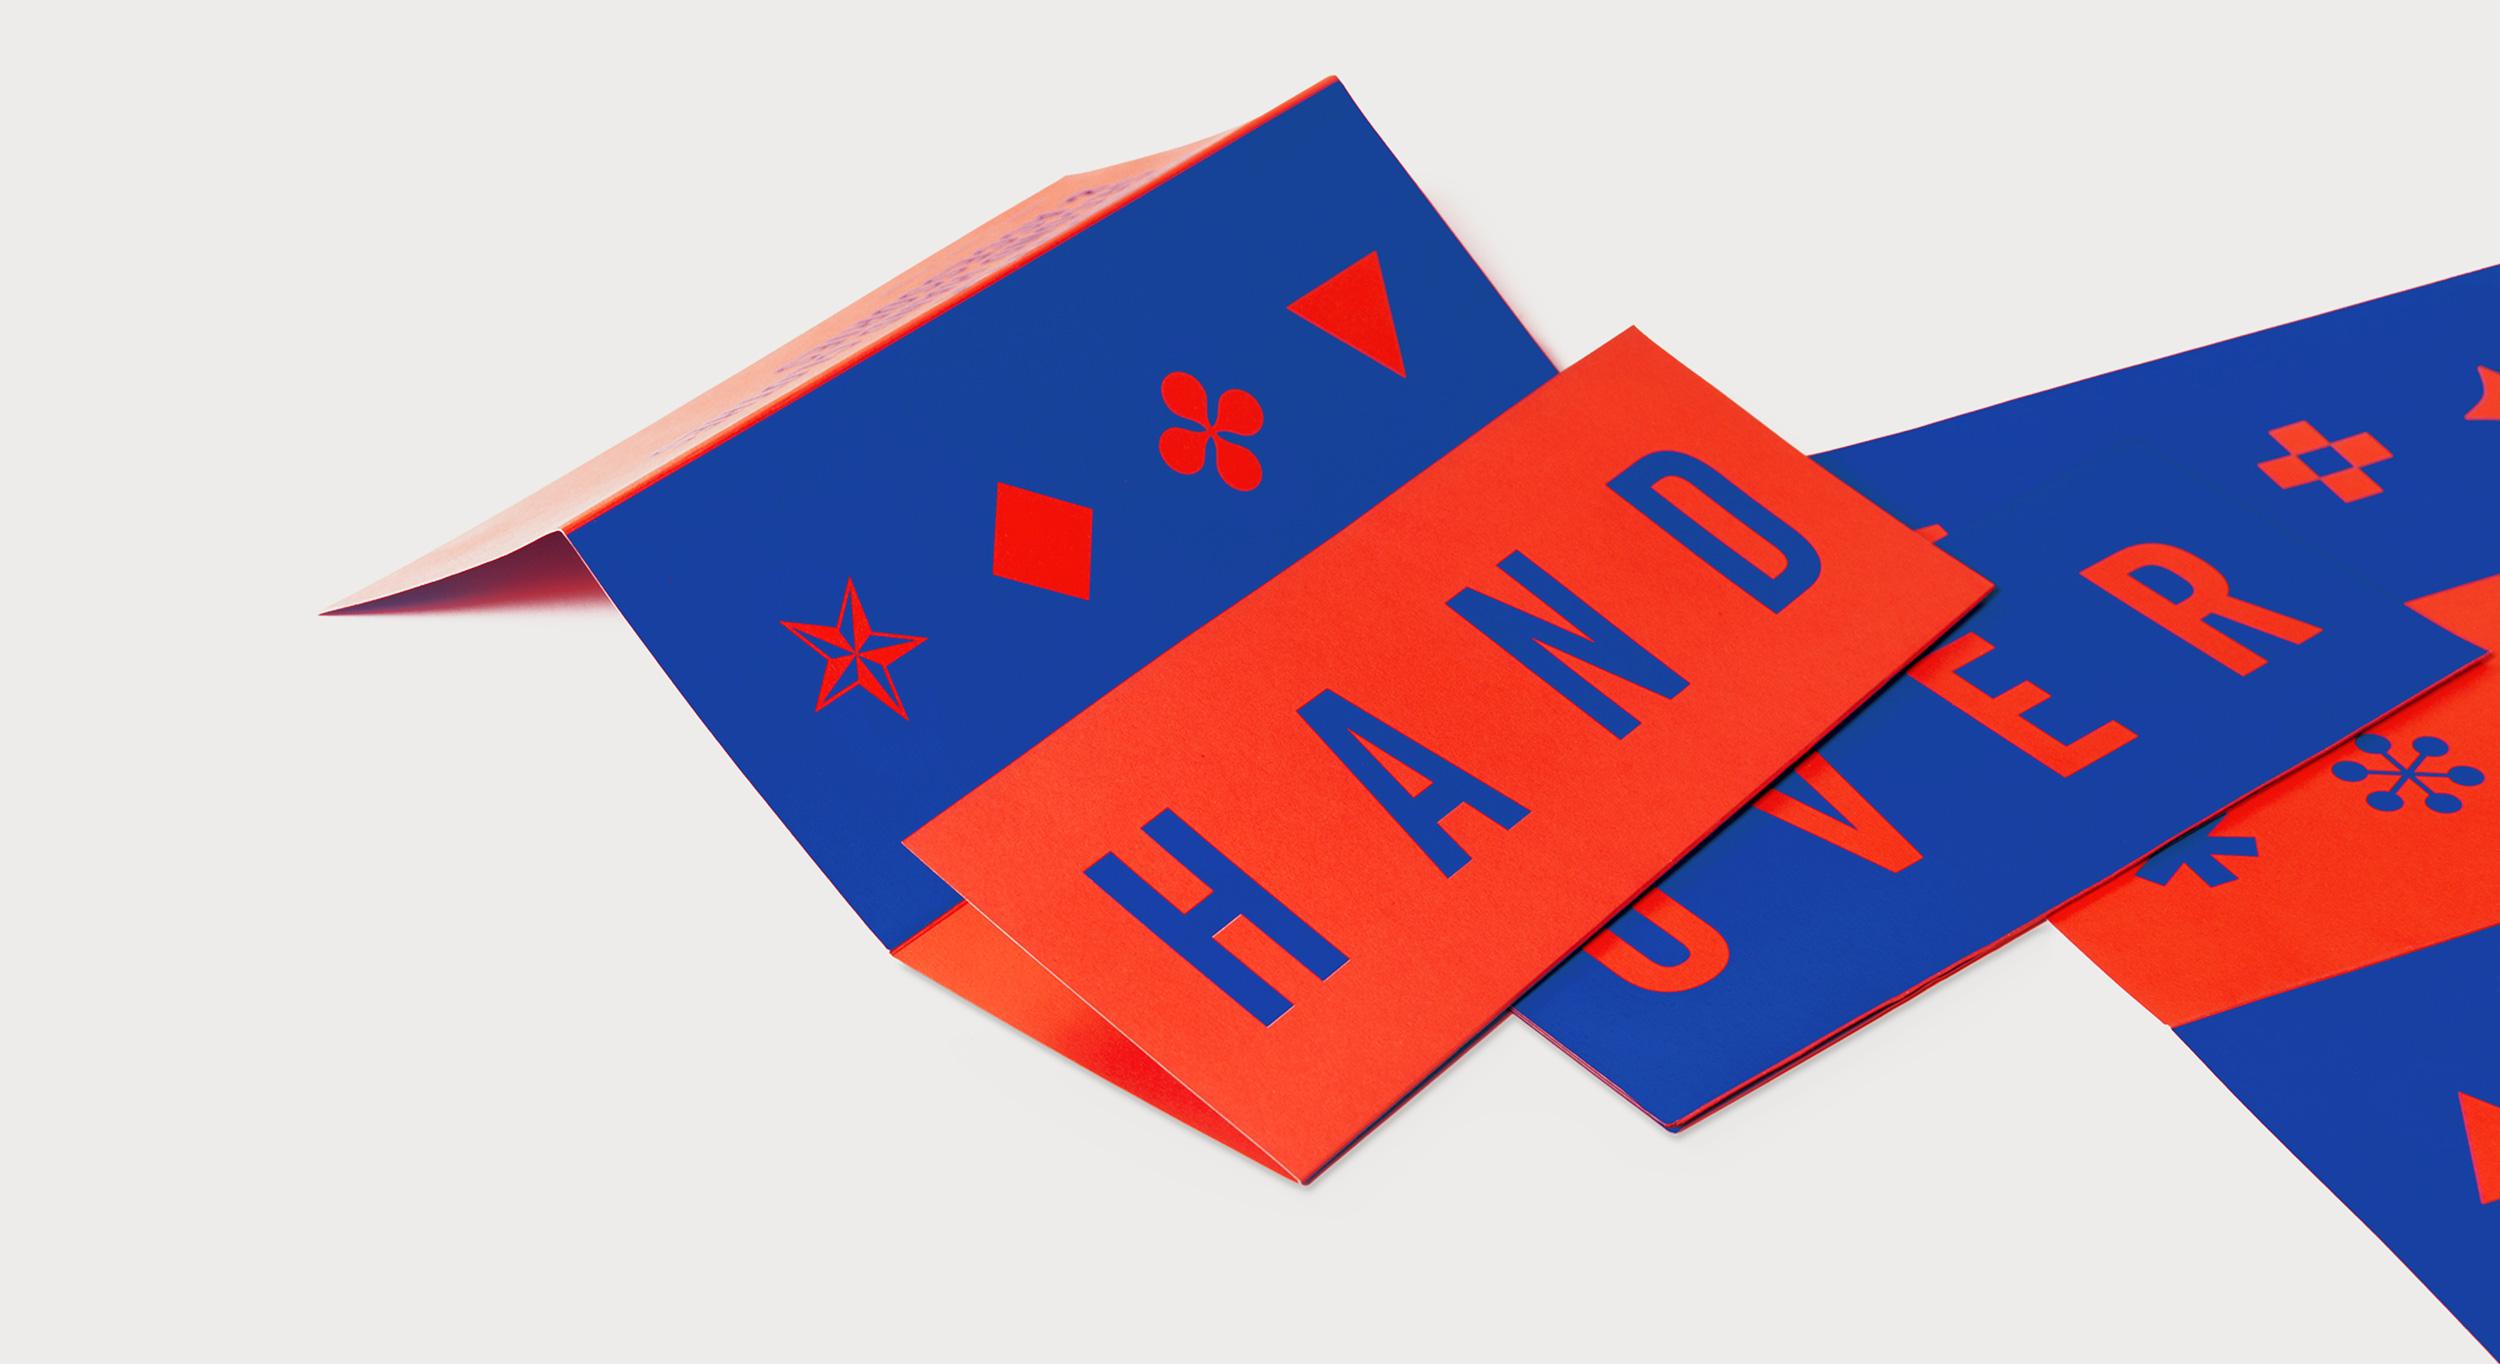 Handover_Banners_Banner-9